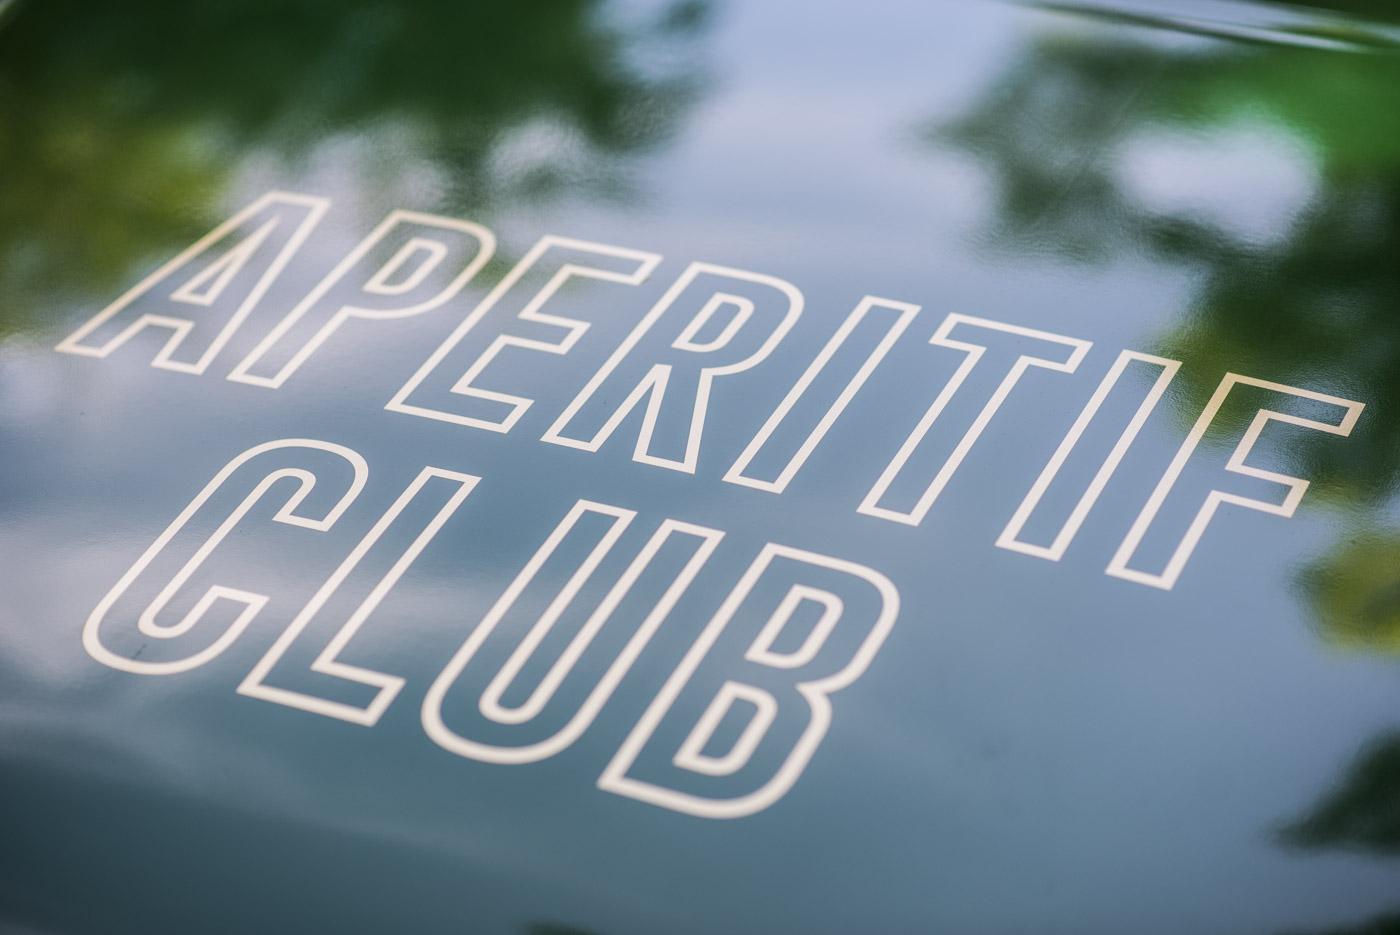 aperitif club, aperitif, 100% belge, studio fiftyfifty, fiftyfifty, agence de graphisme, agence de communication, bruxelles, stratégie, stratège, branding, brand activation, content marketing